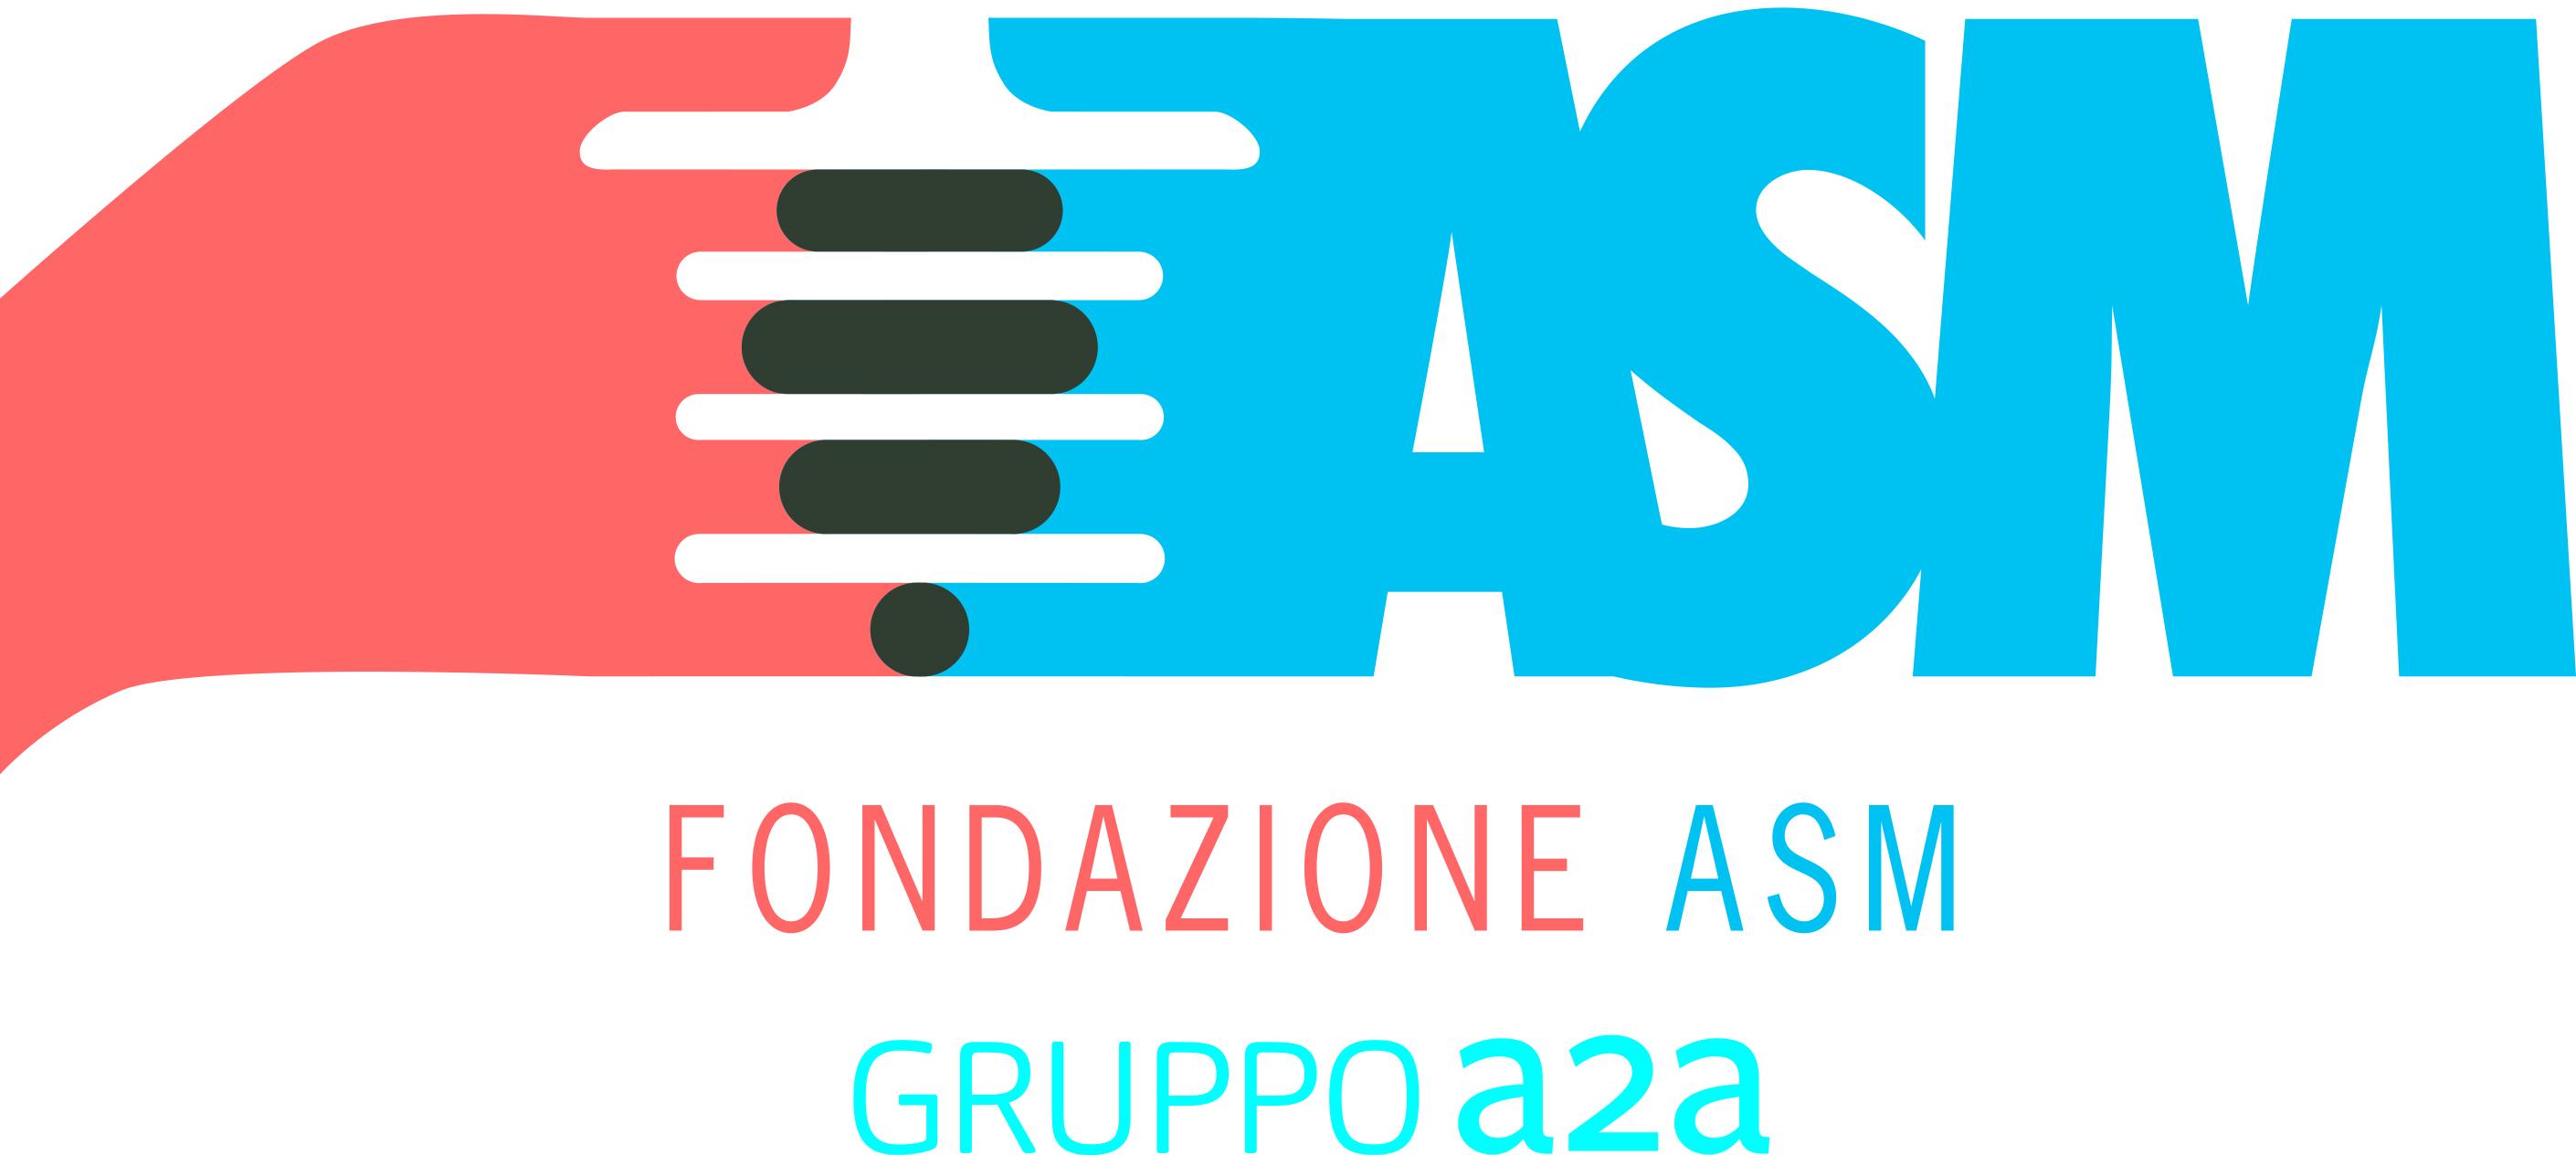 Fondazione ASM